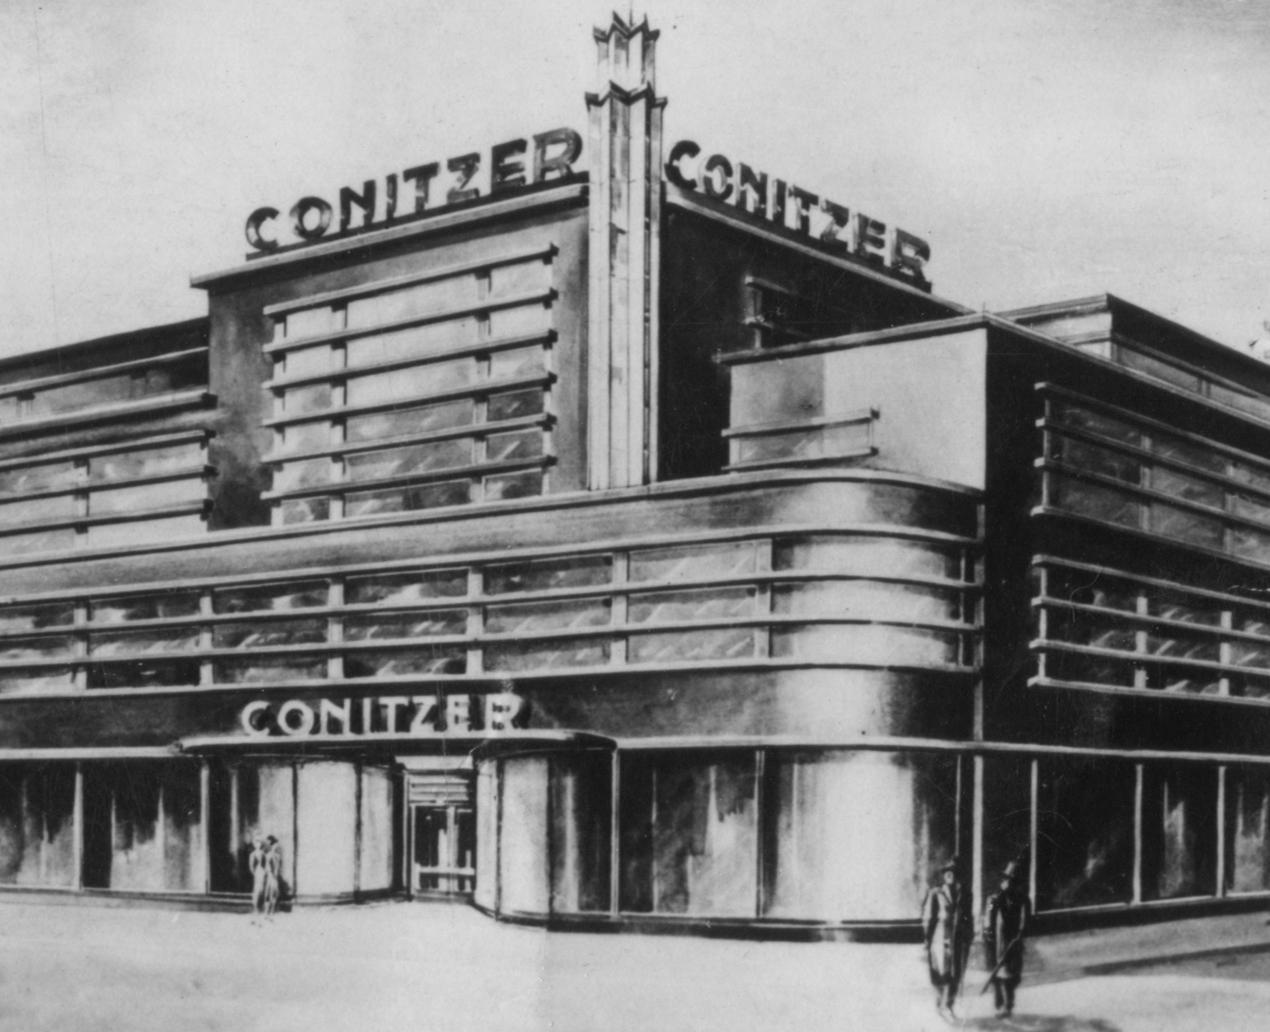 Conitzer-Kaufhaus 1928-29 ©Archiv Klaus Blechschmidt